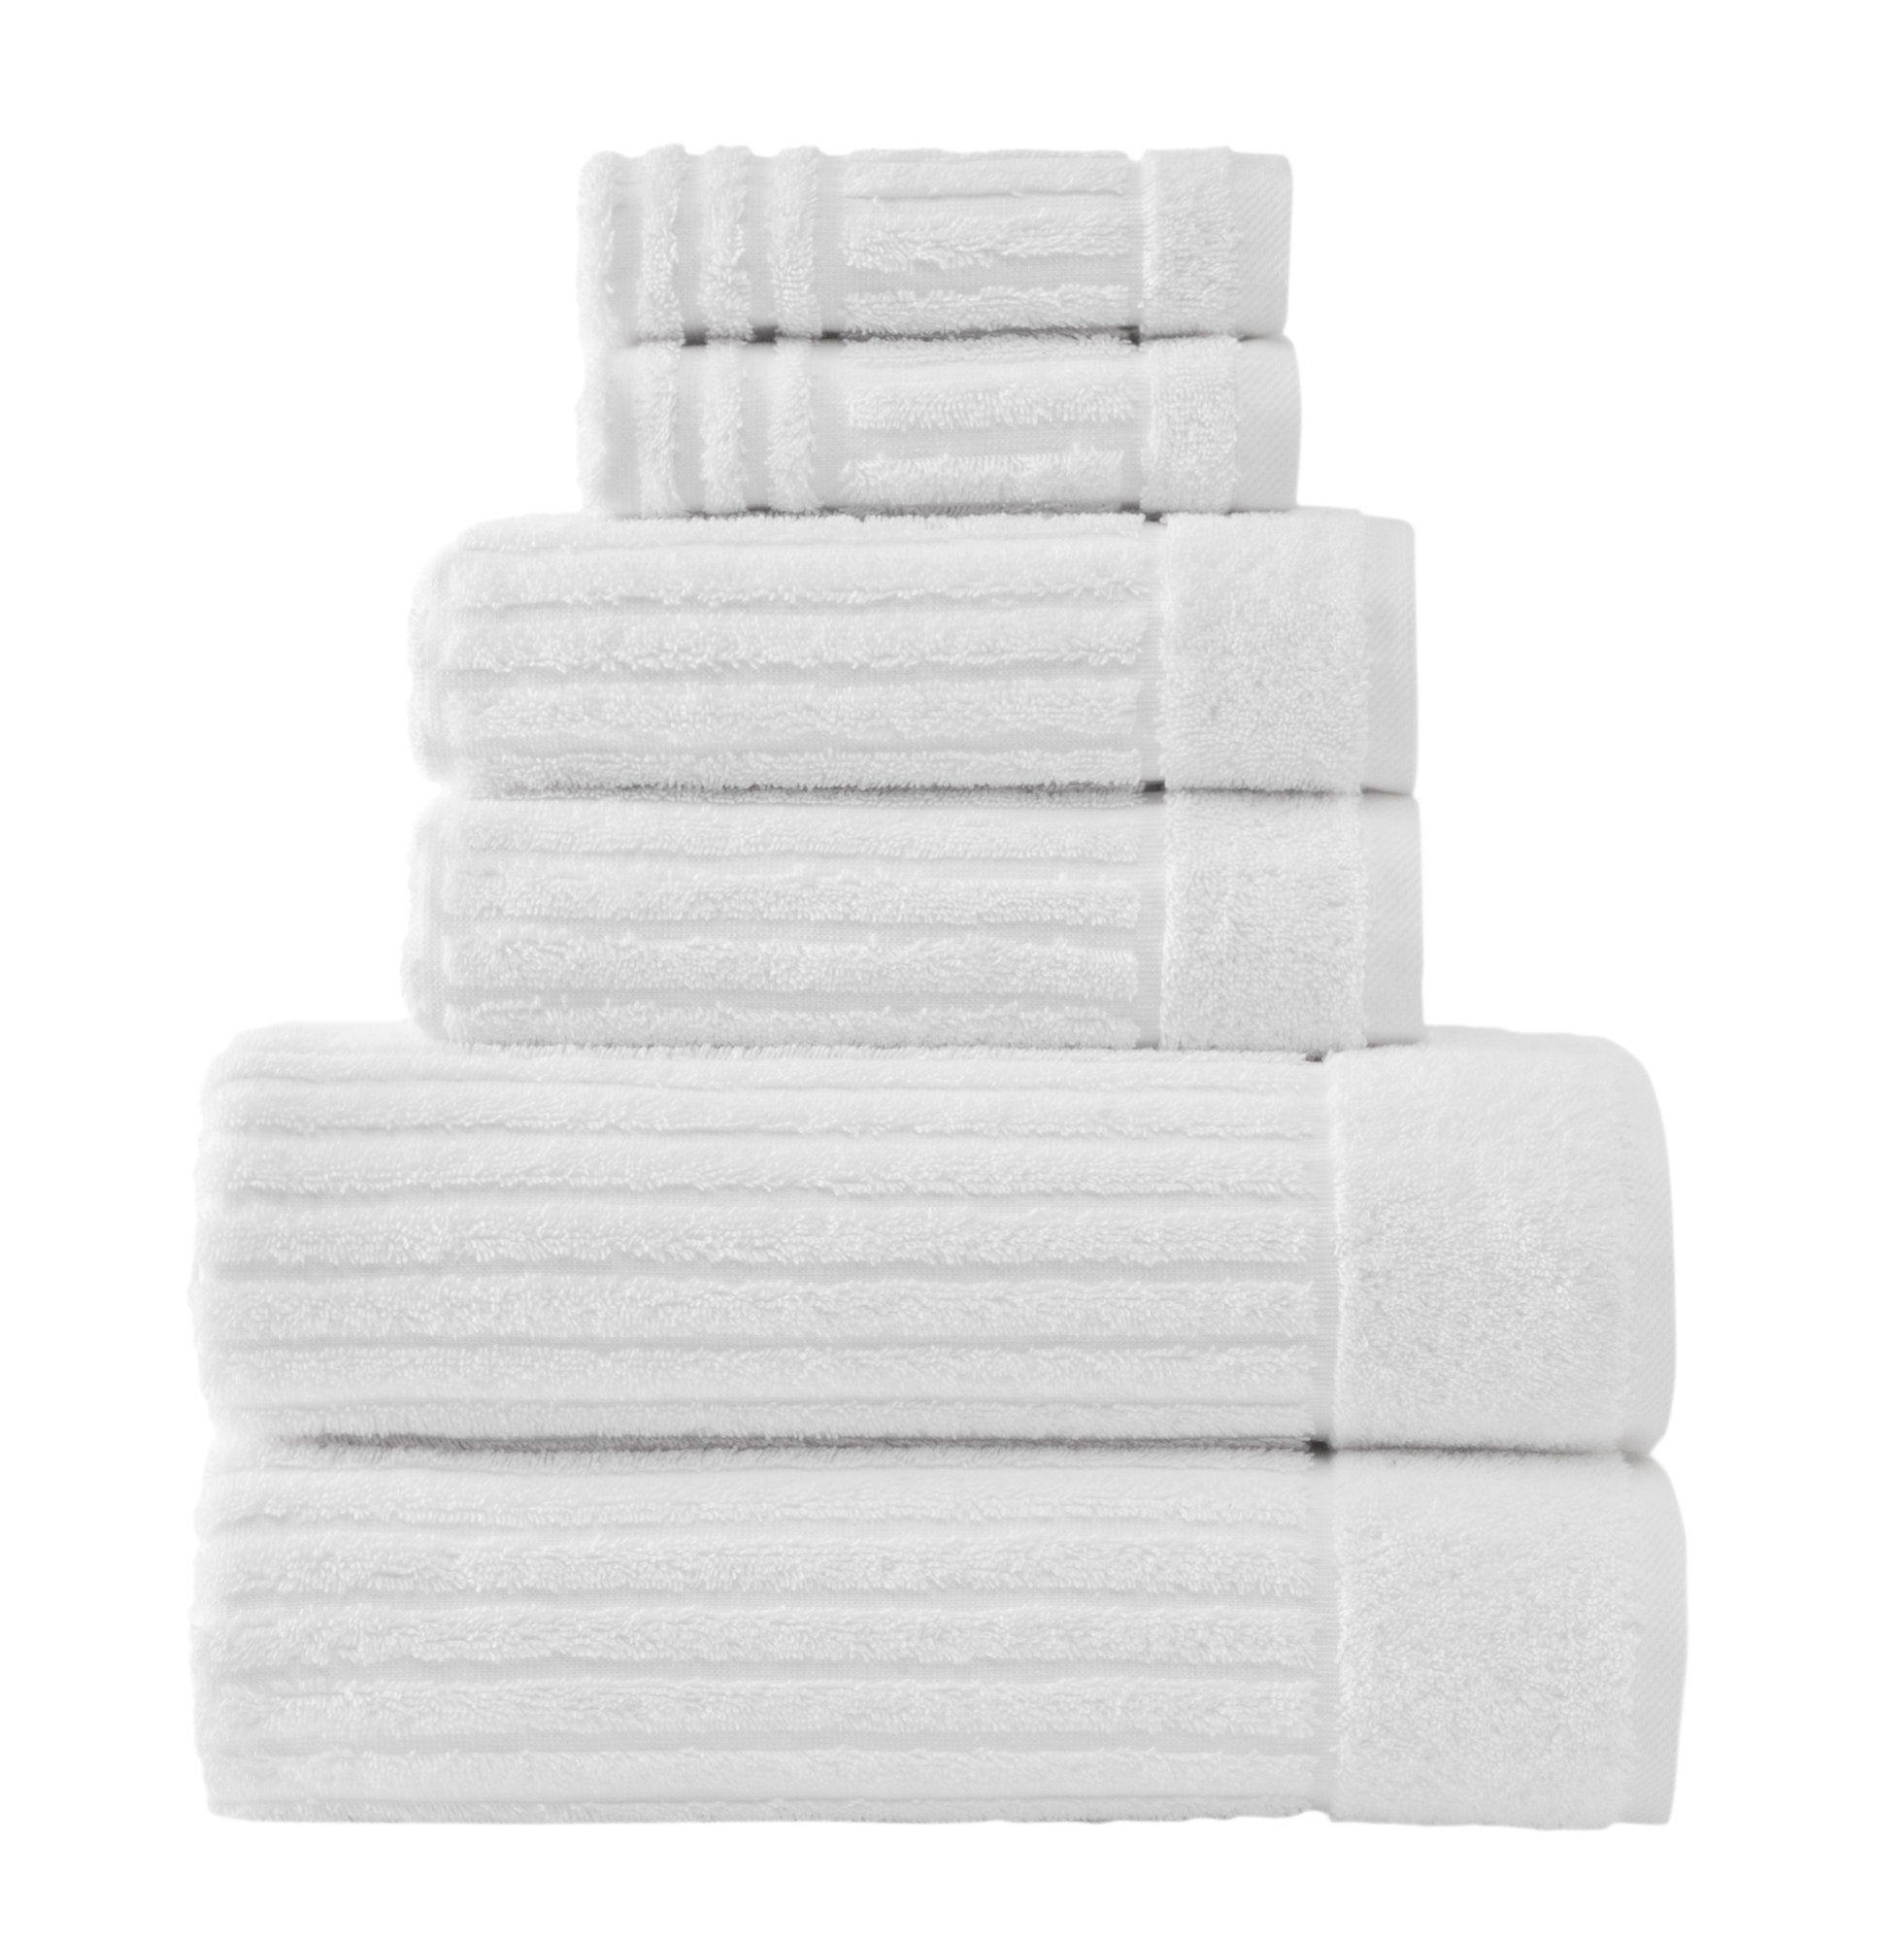 Shimmer Turkish 6 Piece Towel Set Turkish Cotton Towels Towel